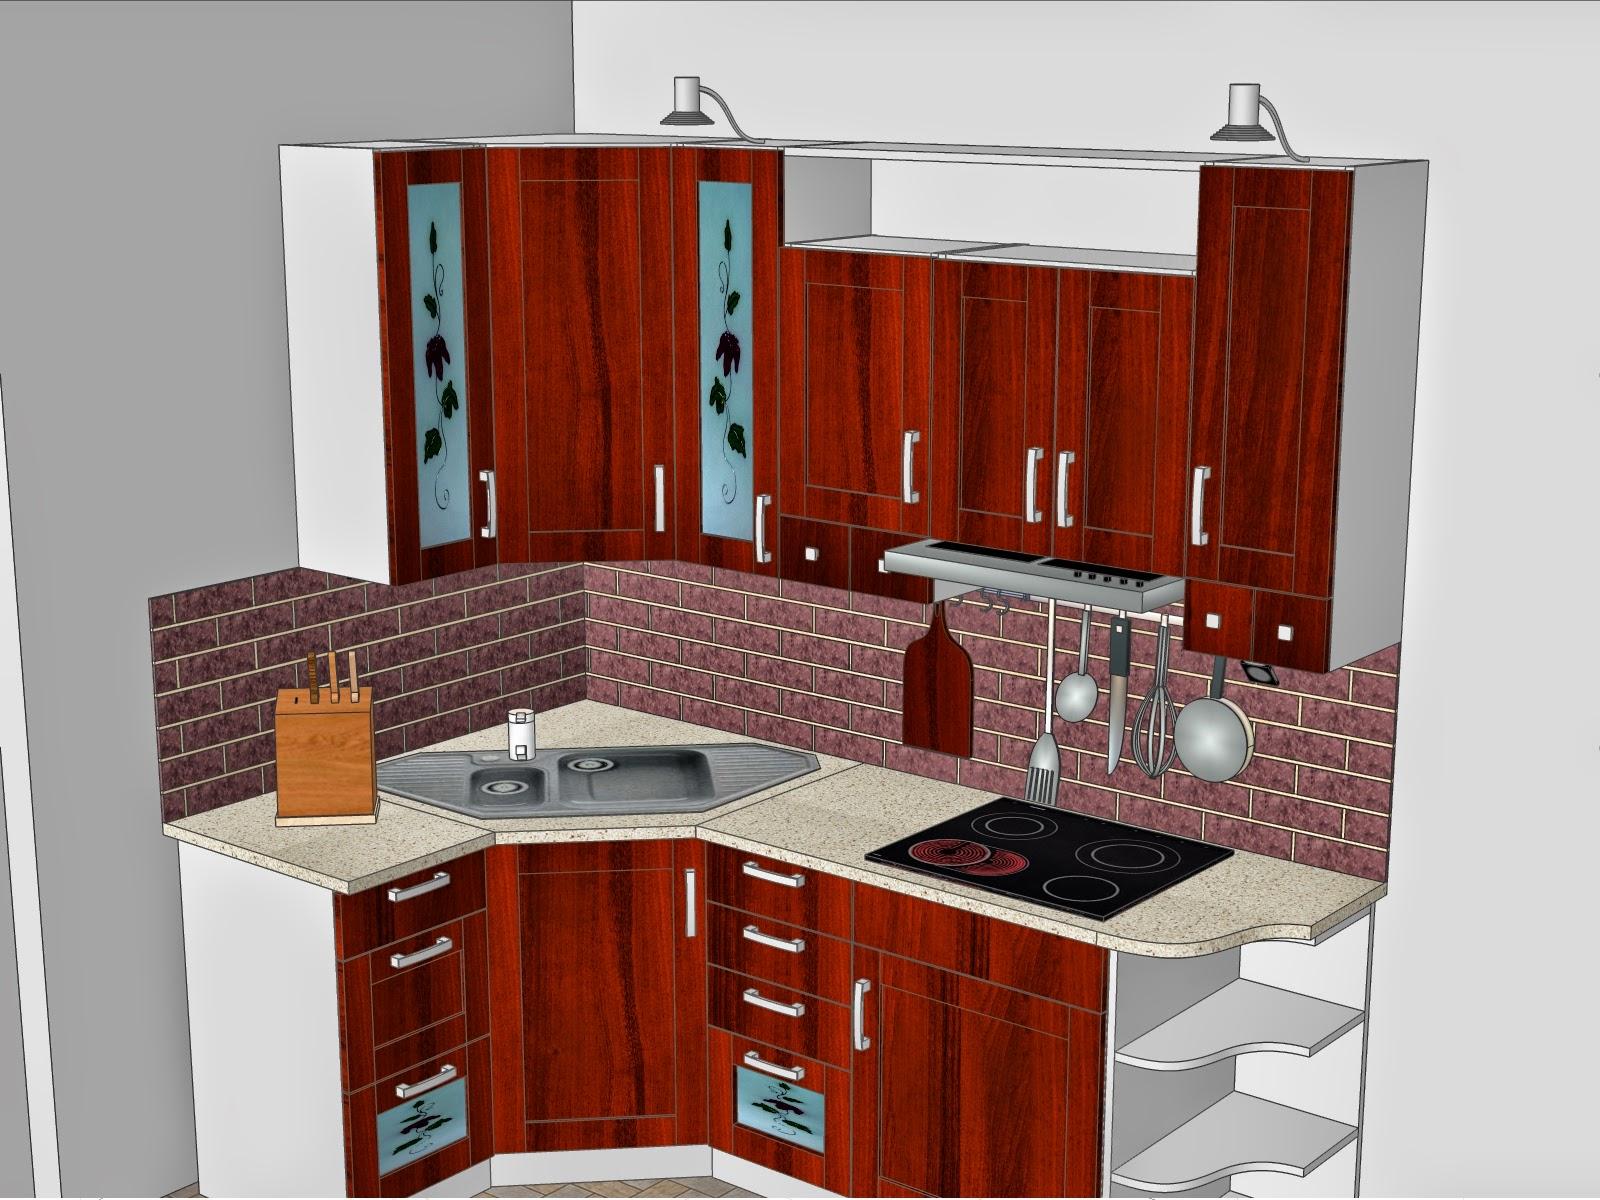 Kichen set sederhana cocok untuk ruang dapur yg sempit